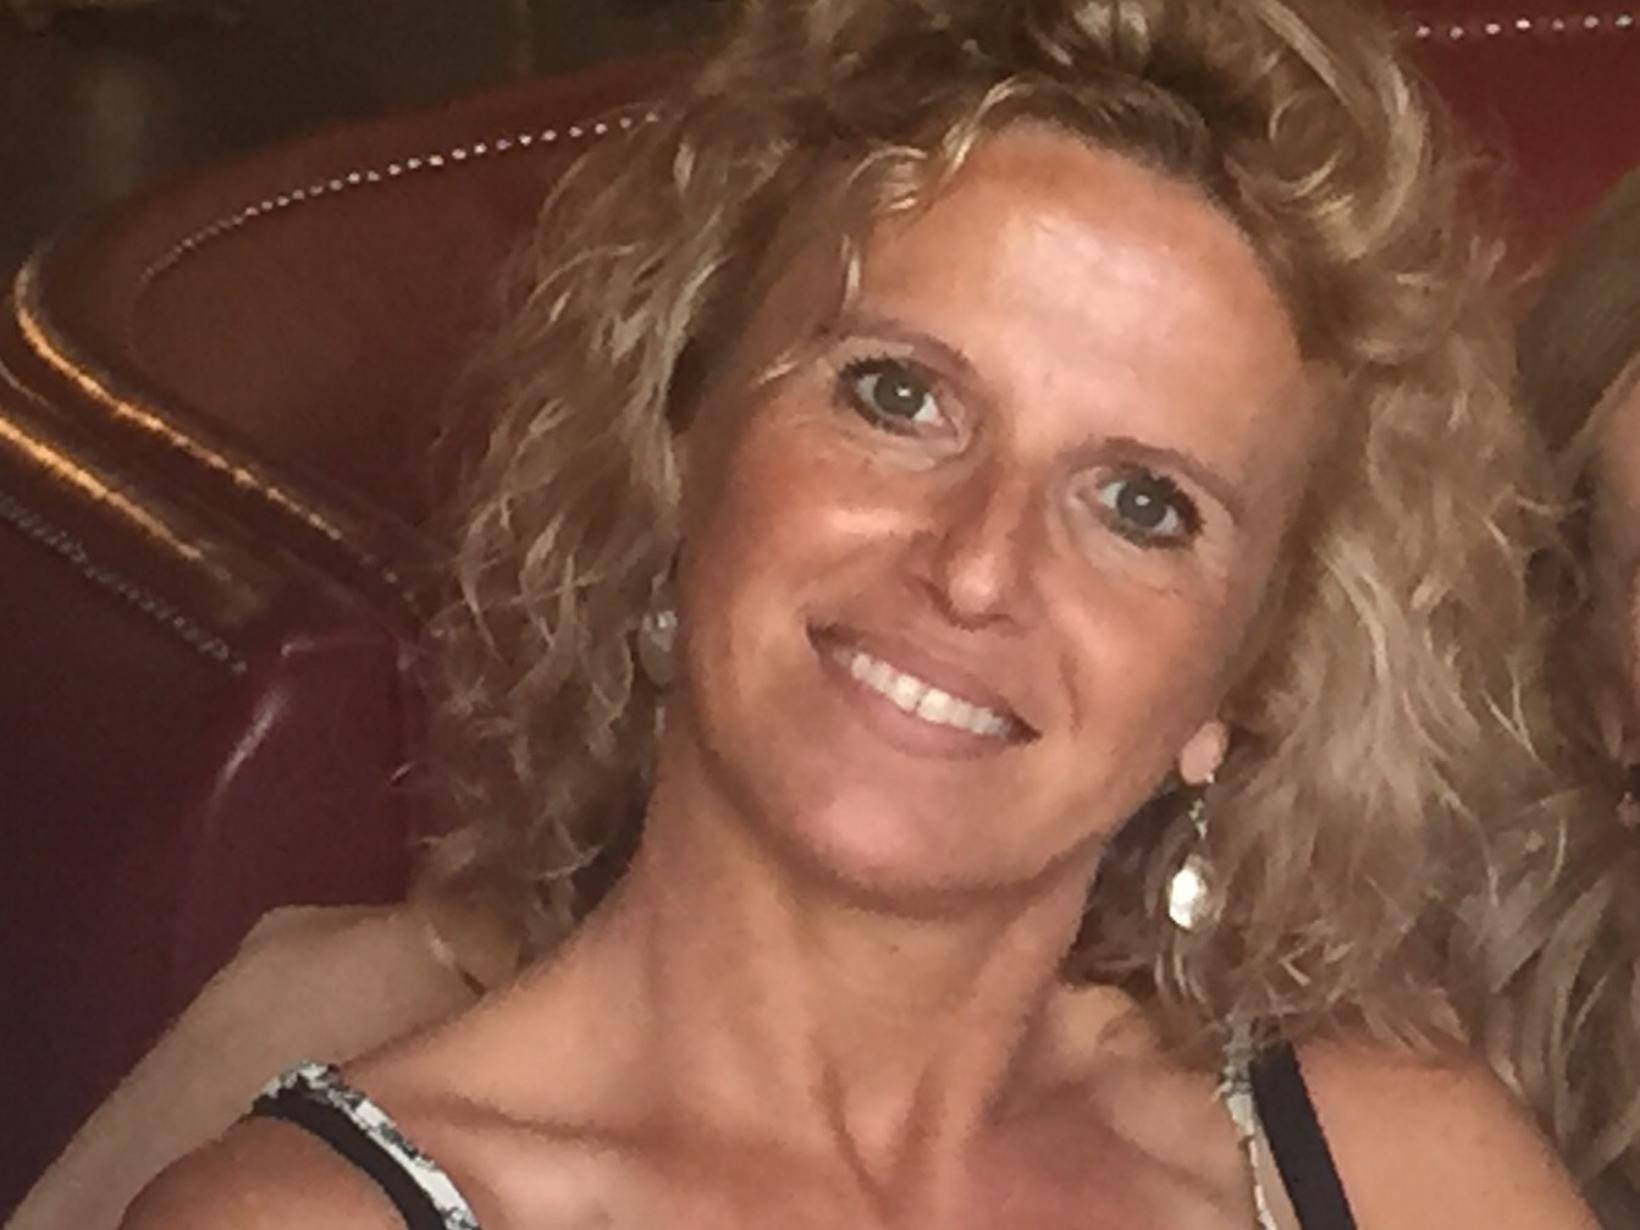 Nancy from Aptos, California, United States